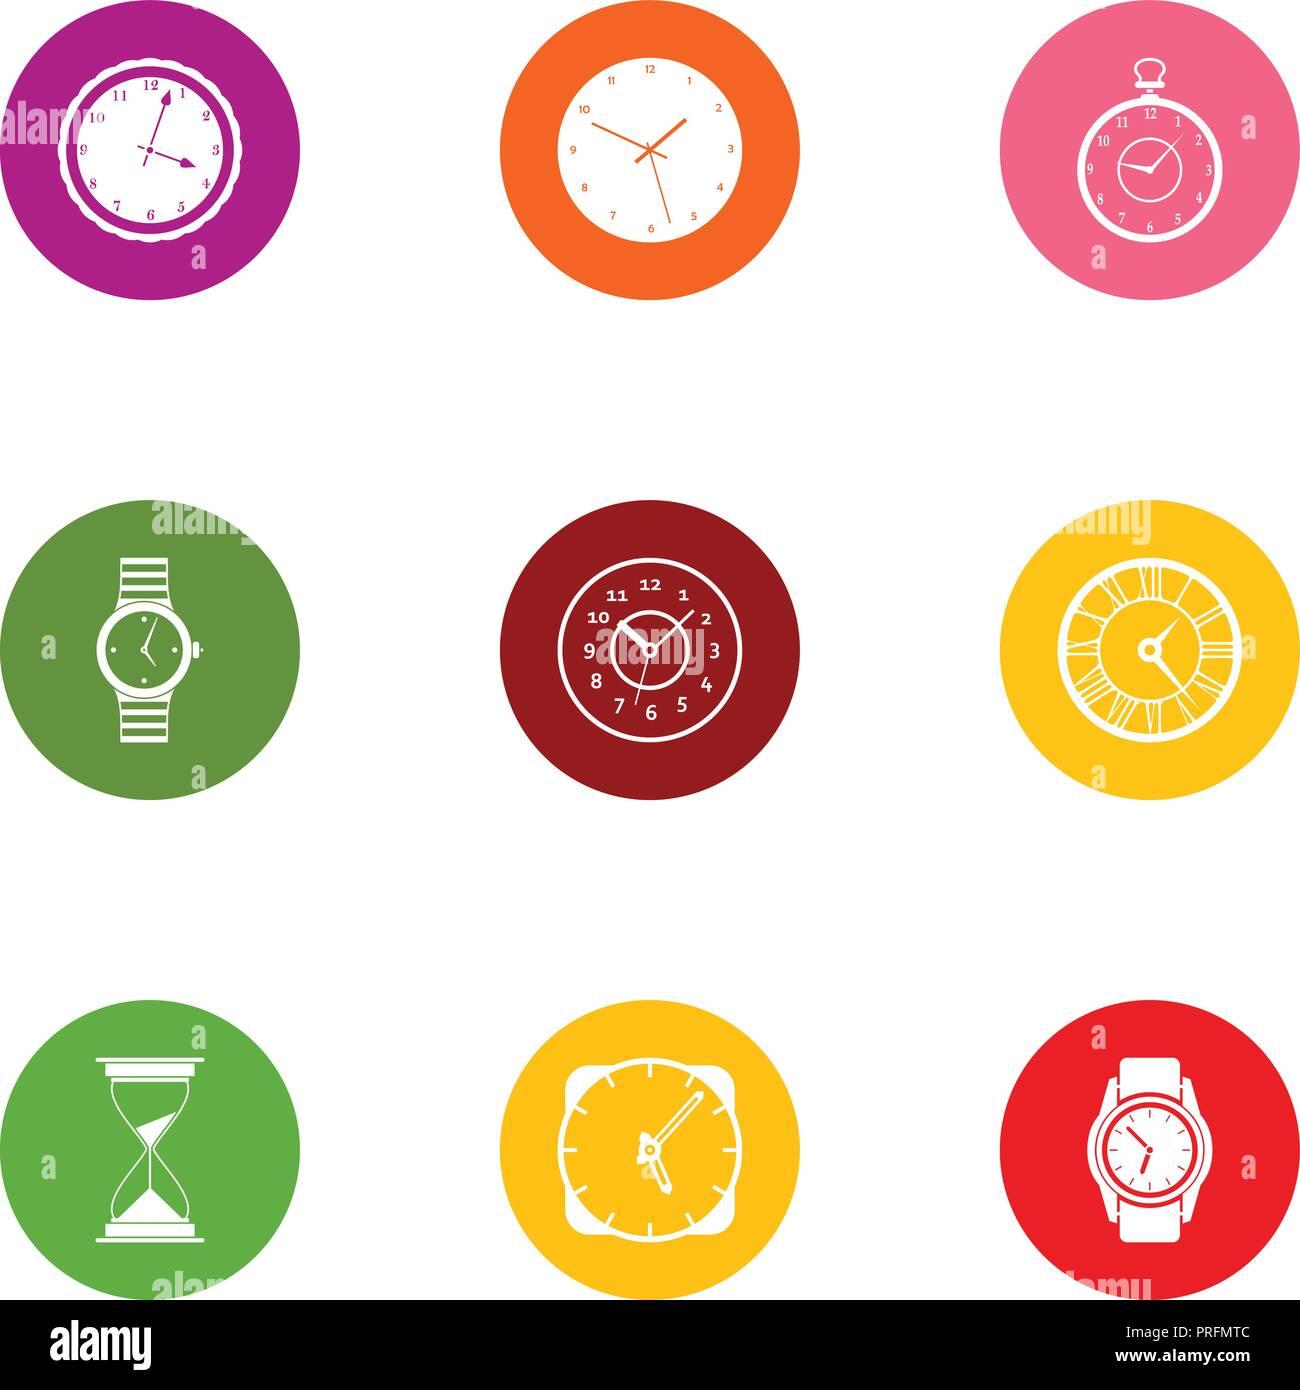 Timepiece icons set, flat style - Stock Image